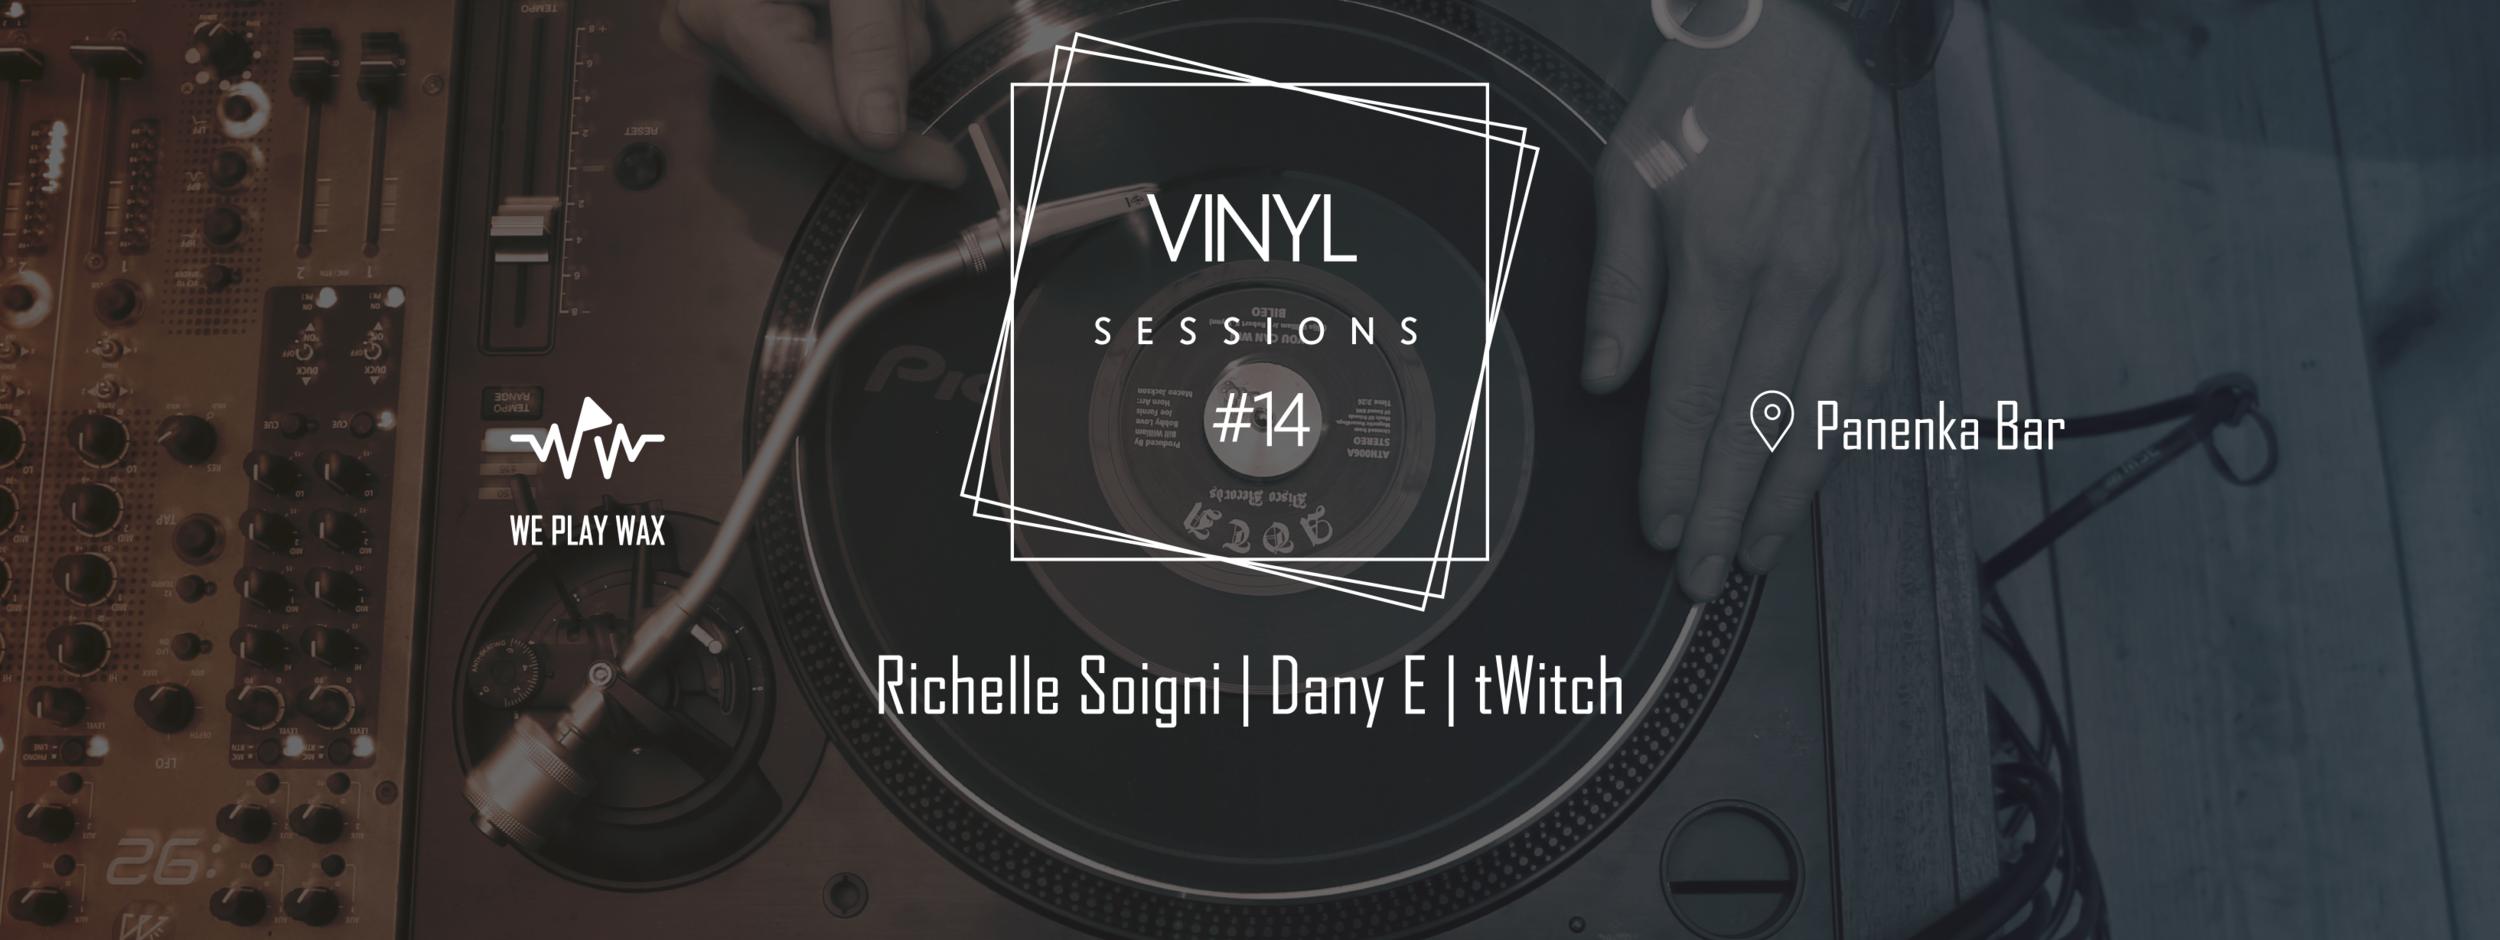 Vinyl Sessions #02 - Richelle Soigni, Dany E, tWitch